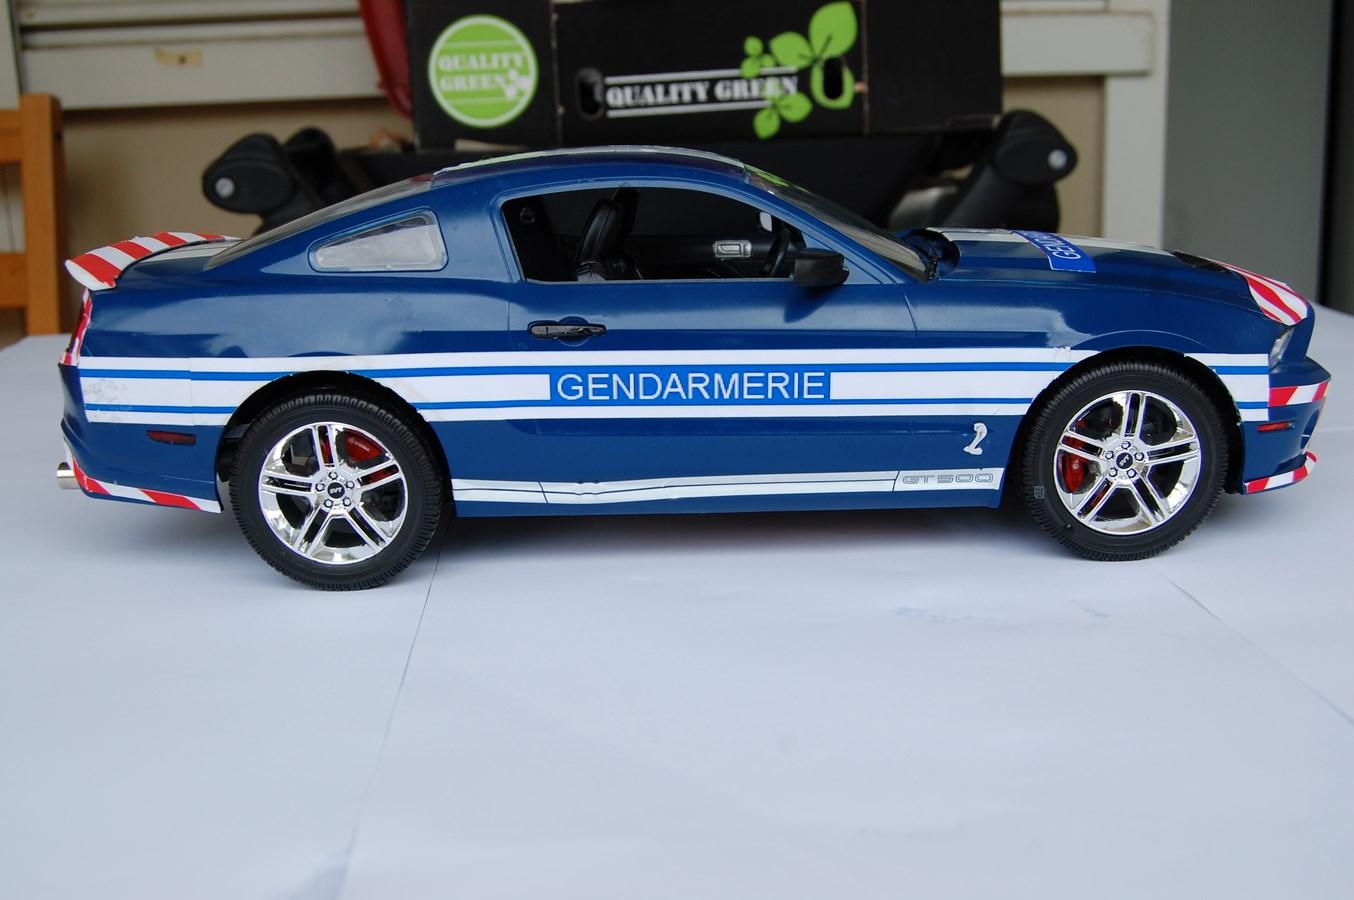 Shelby GT 500 version imaginaire Gendarmerie - Page 2 221373Mustang44Copier